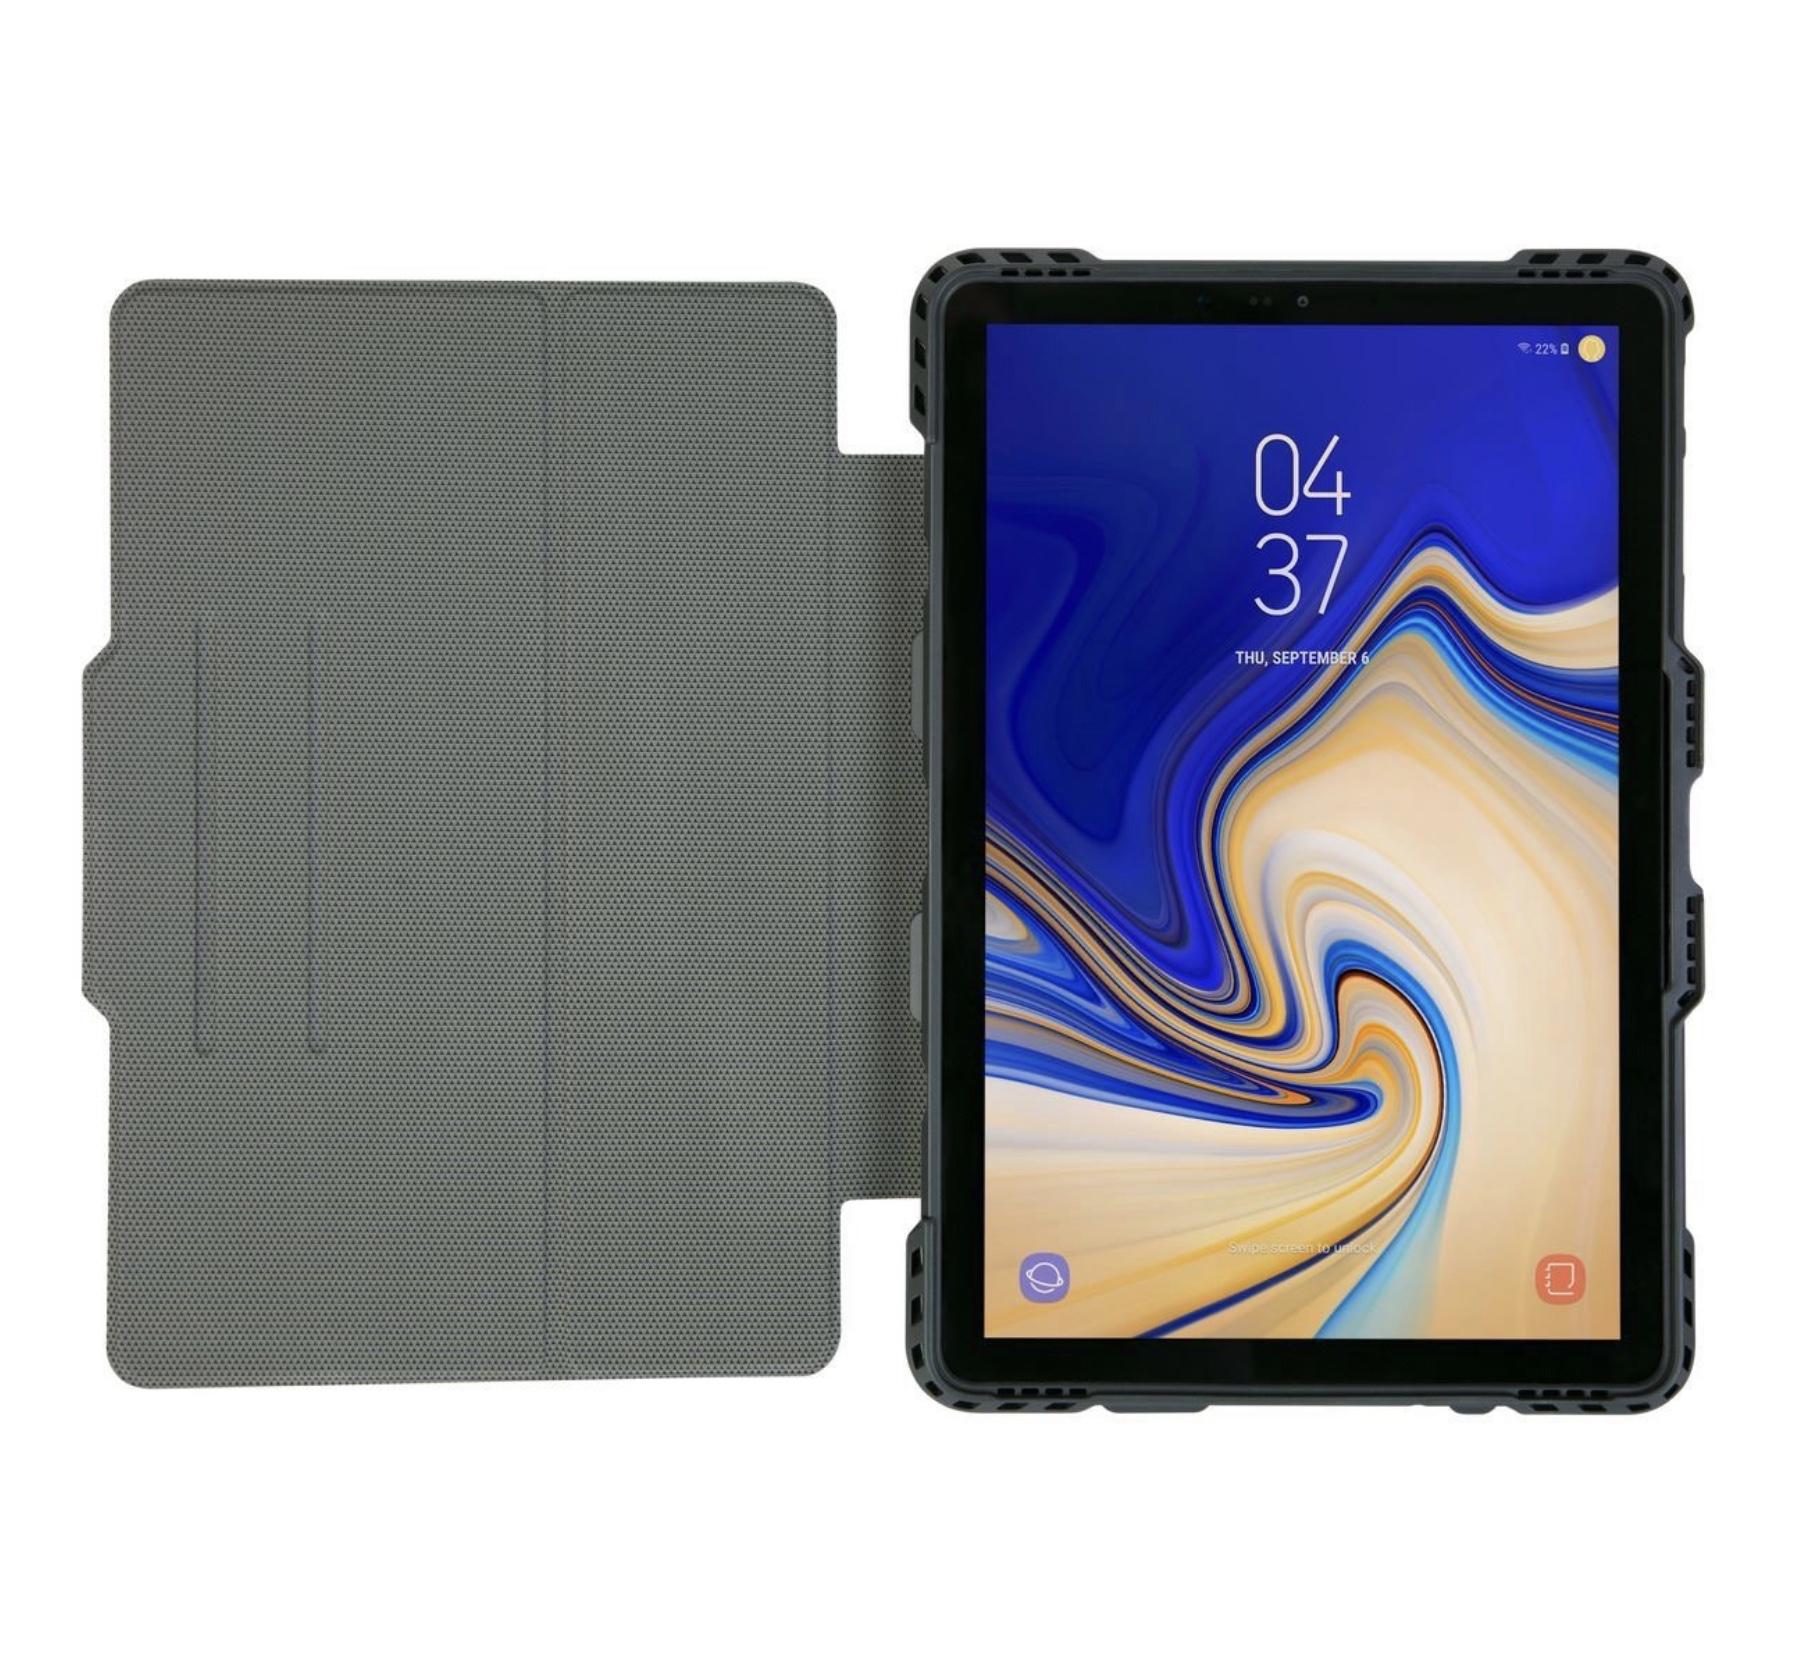 Etui de protection Folio ProTek Samsung Galaxy TAB S4 10.5 pouces